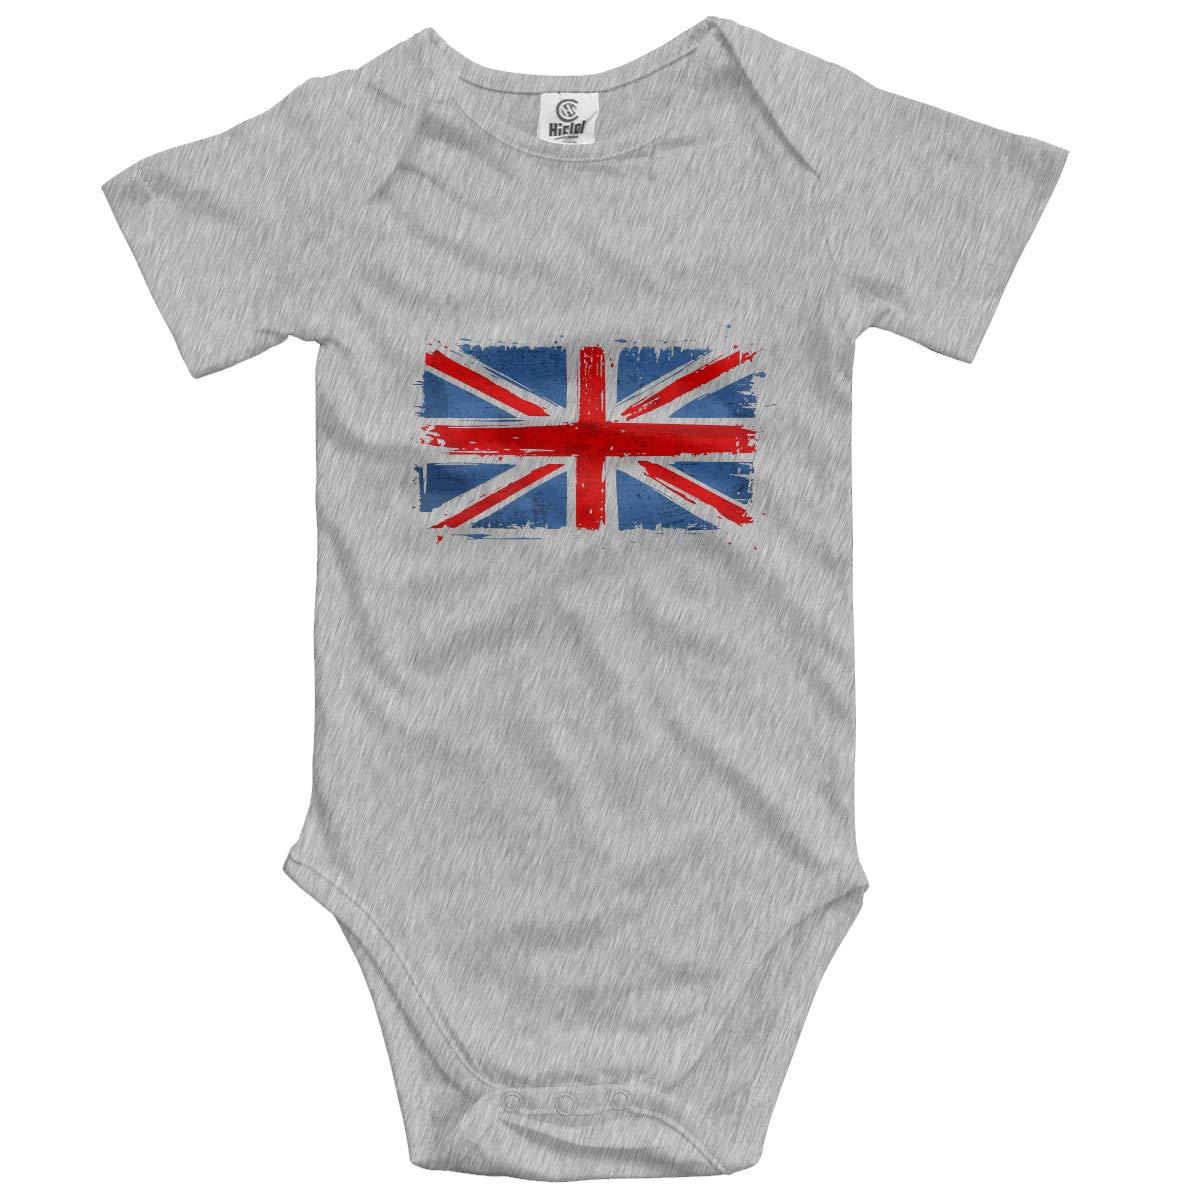 CUTEDWARF Baby Short-Sleeve Onesies Britain Bodysuit Baby Outfits